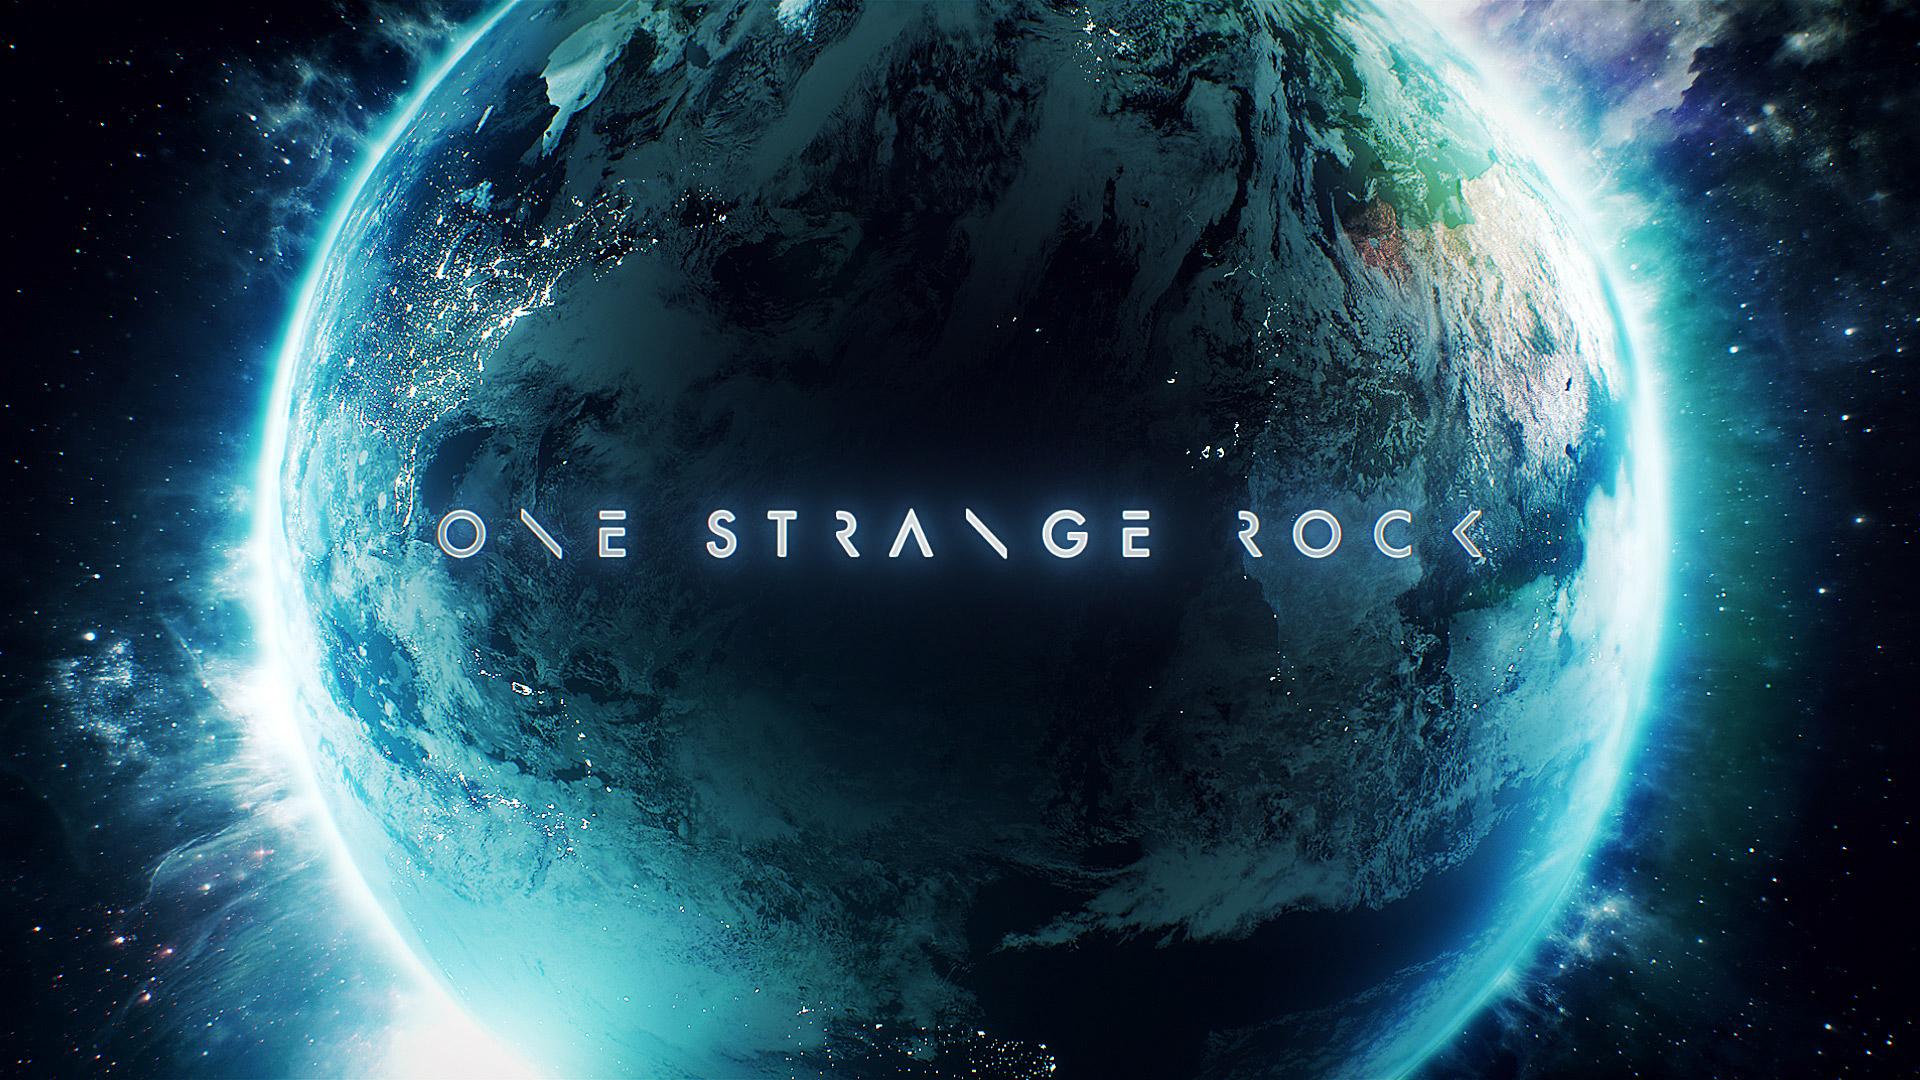 One Strange Rock titles